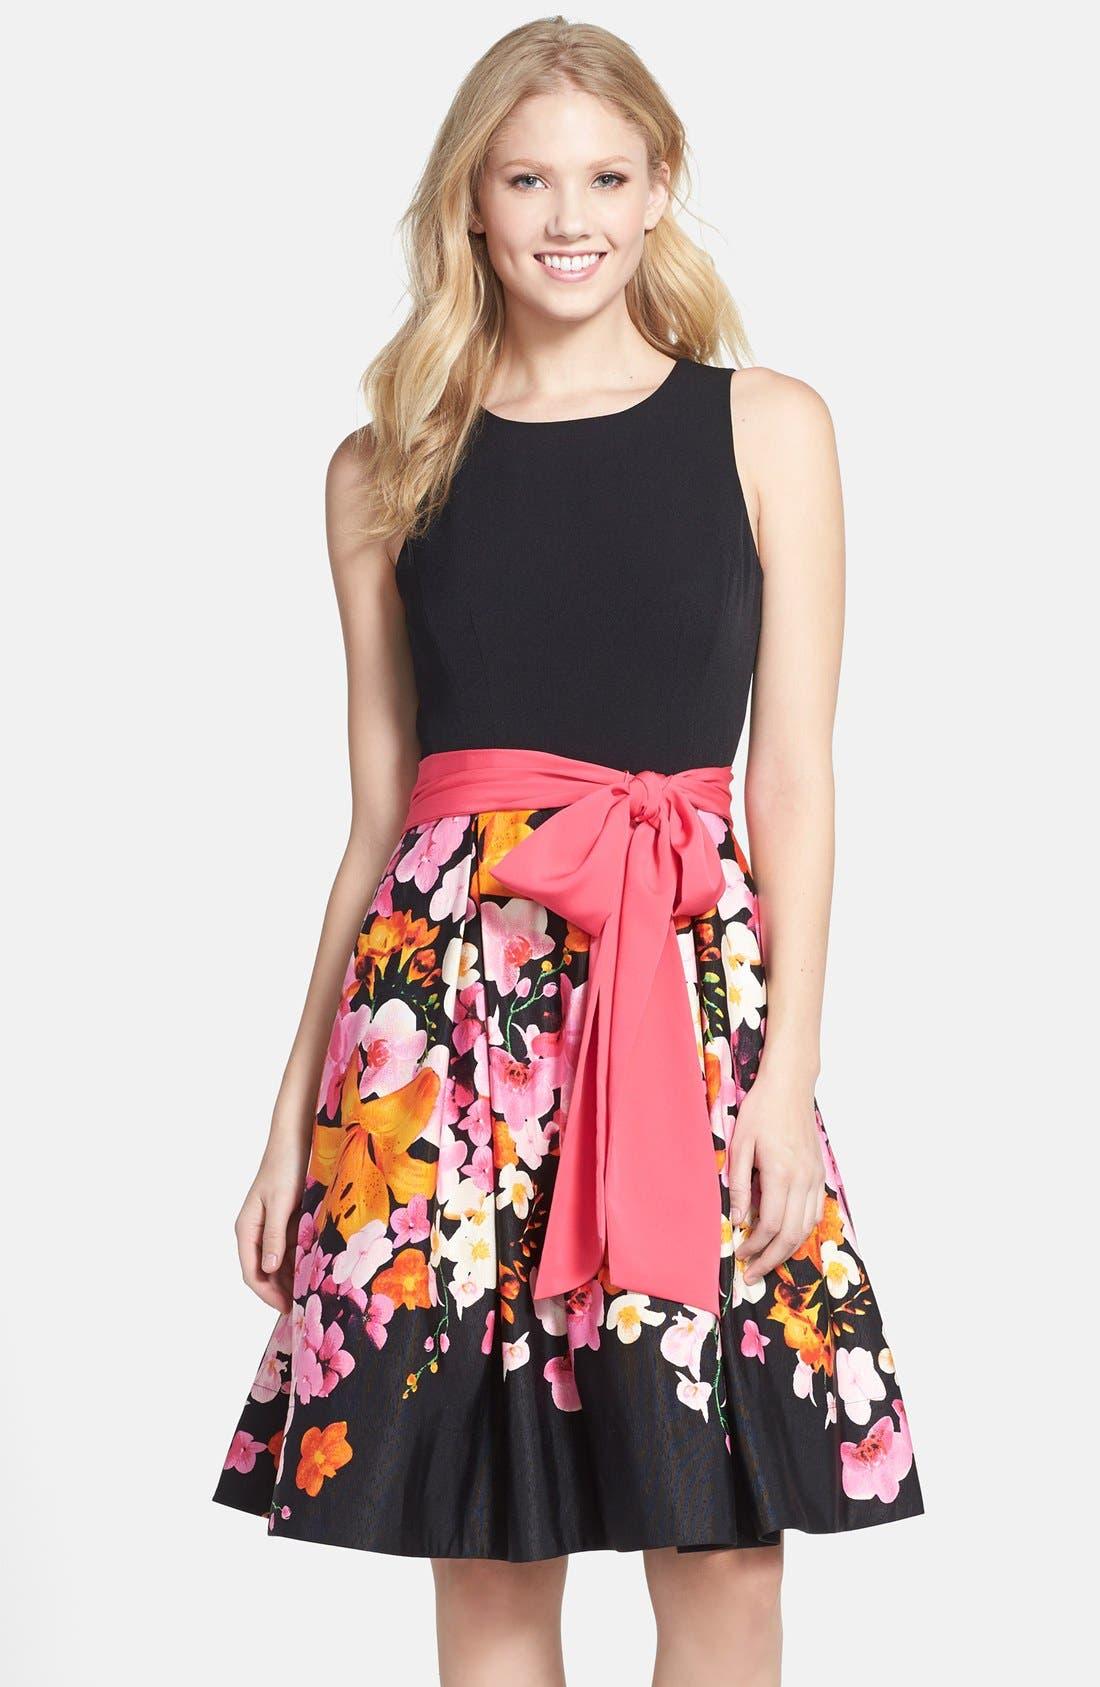 Alternate Image 1 Selected - Eliza J Floral Print Faille Fit & Flare Dress (Regular & Petite)